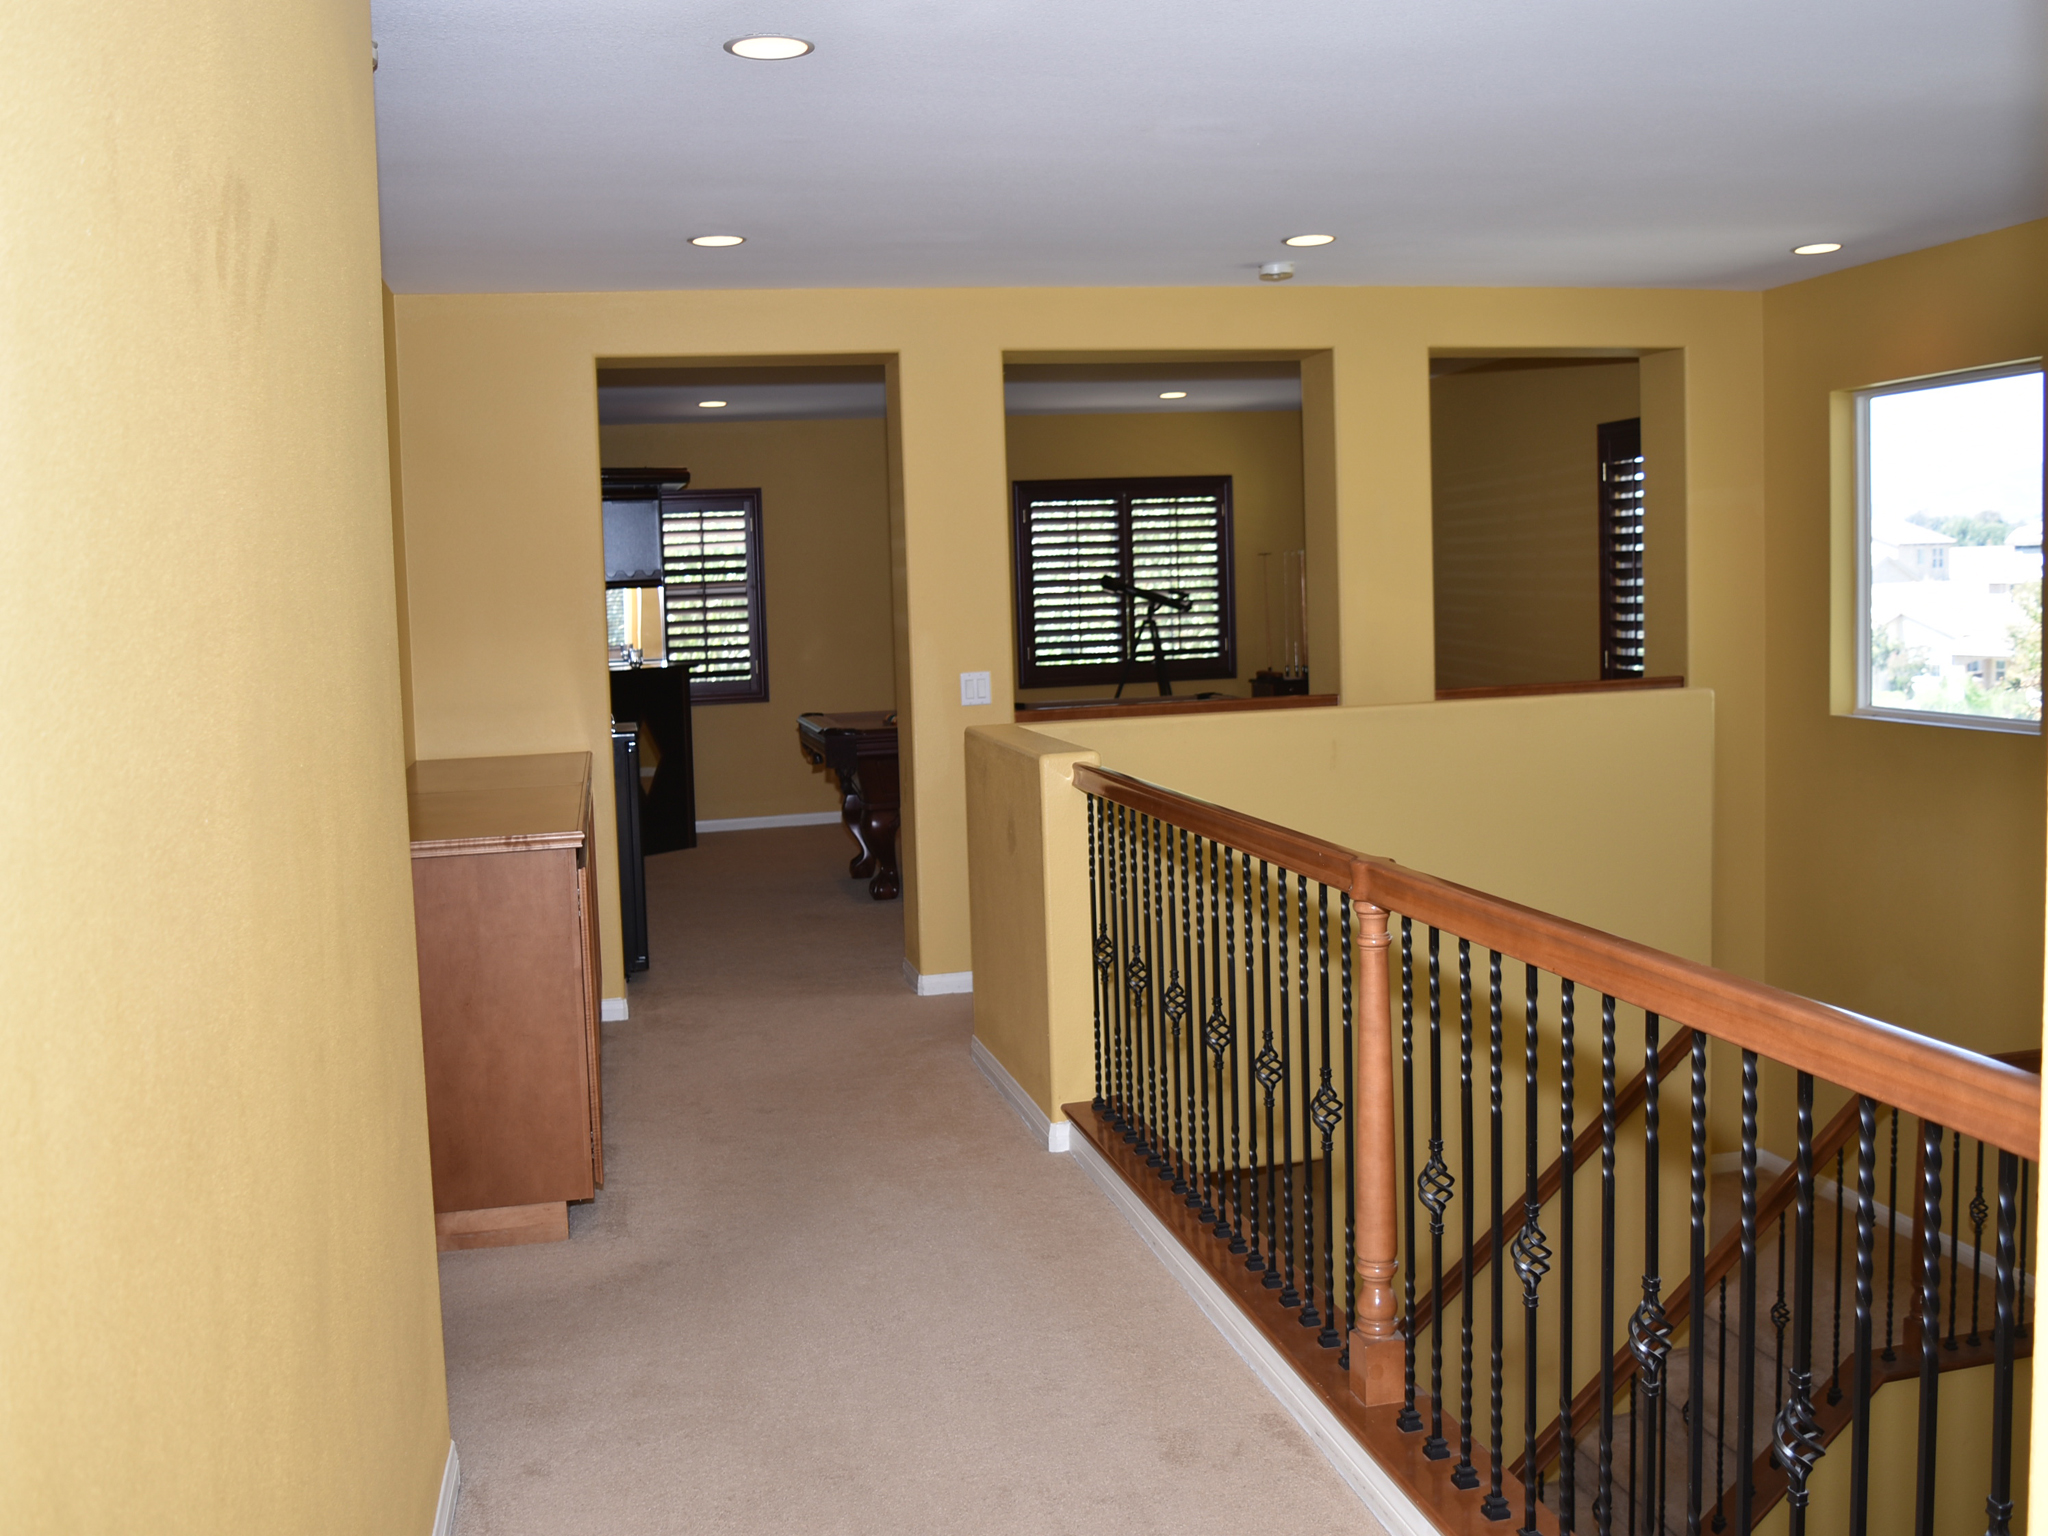 124 Boston Ave., Beaumont Ca. 92223 upstairs